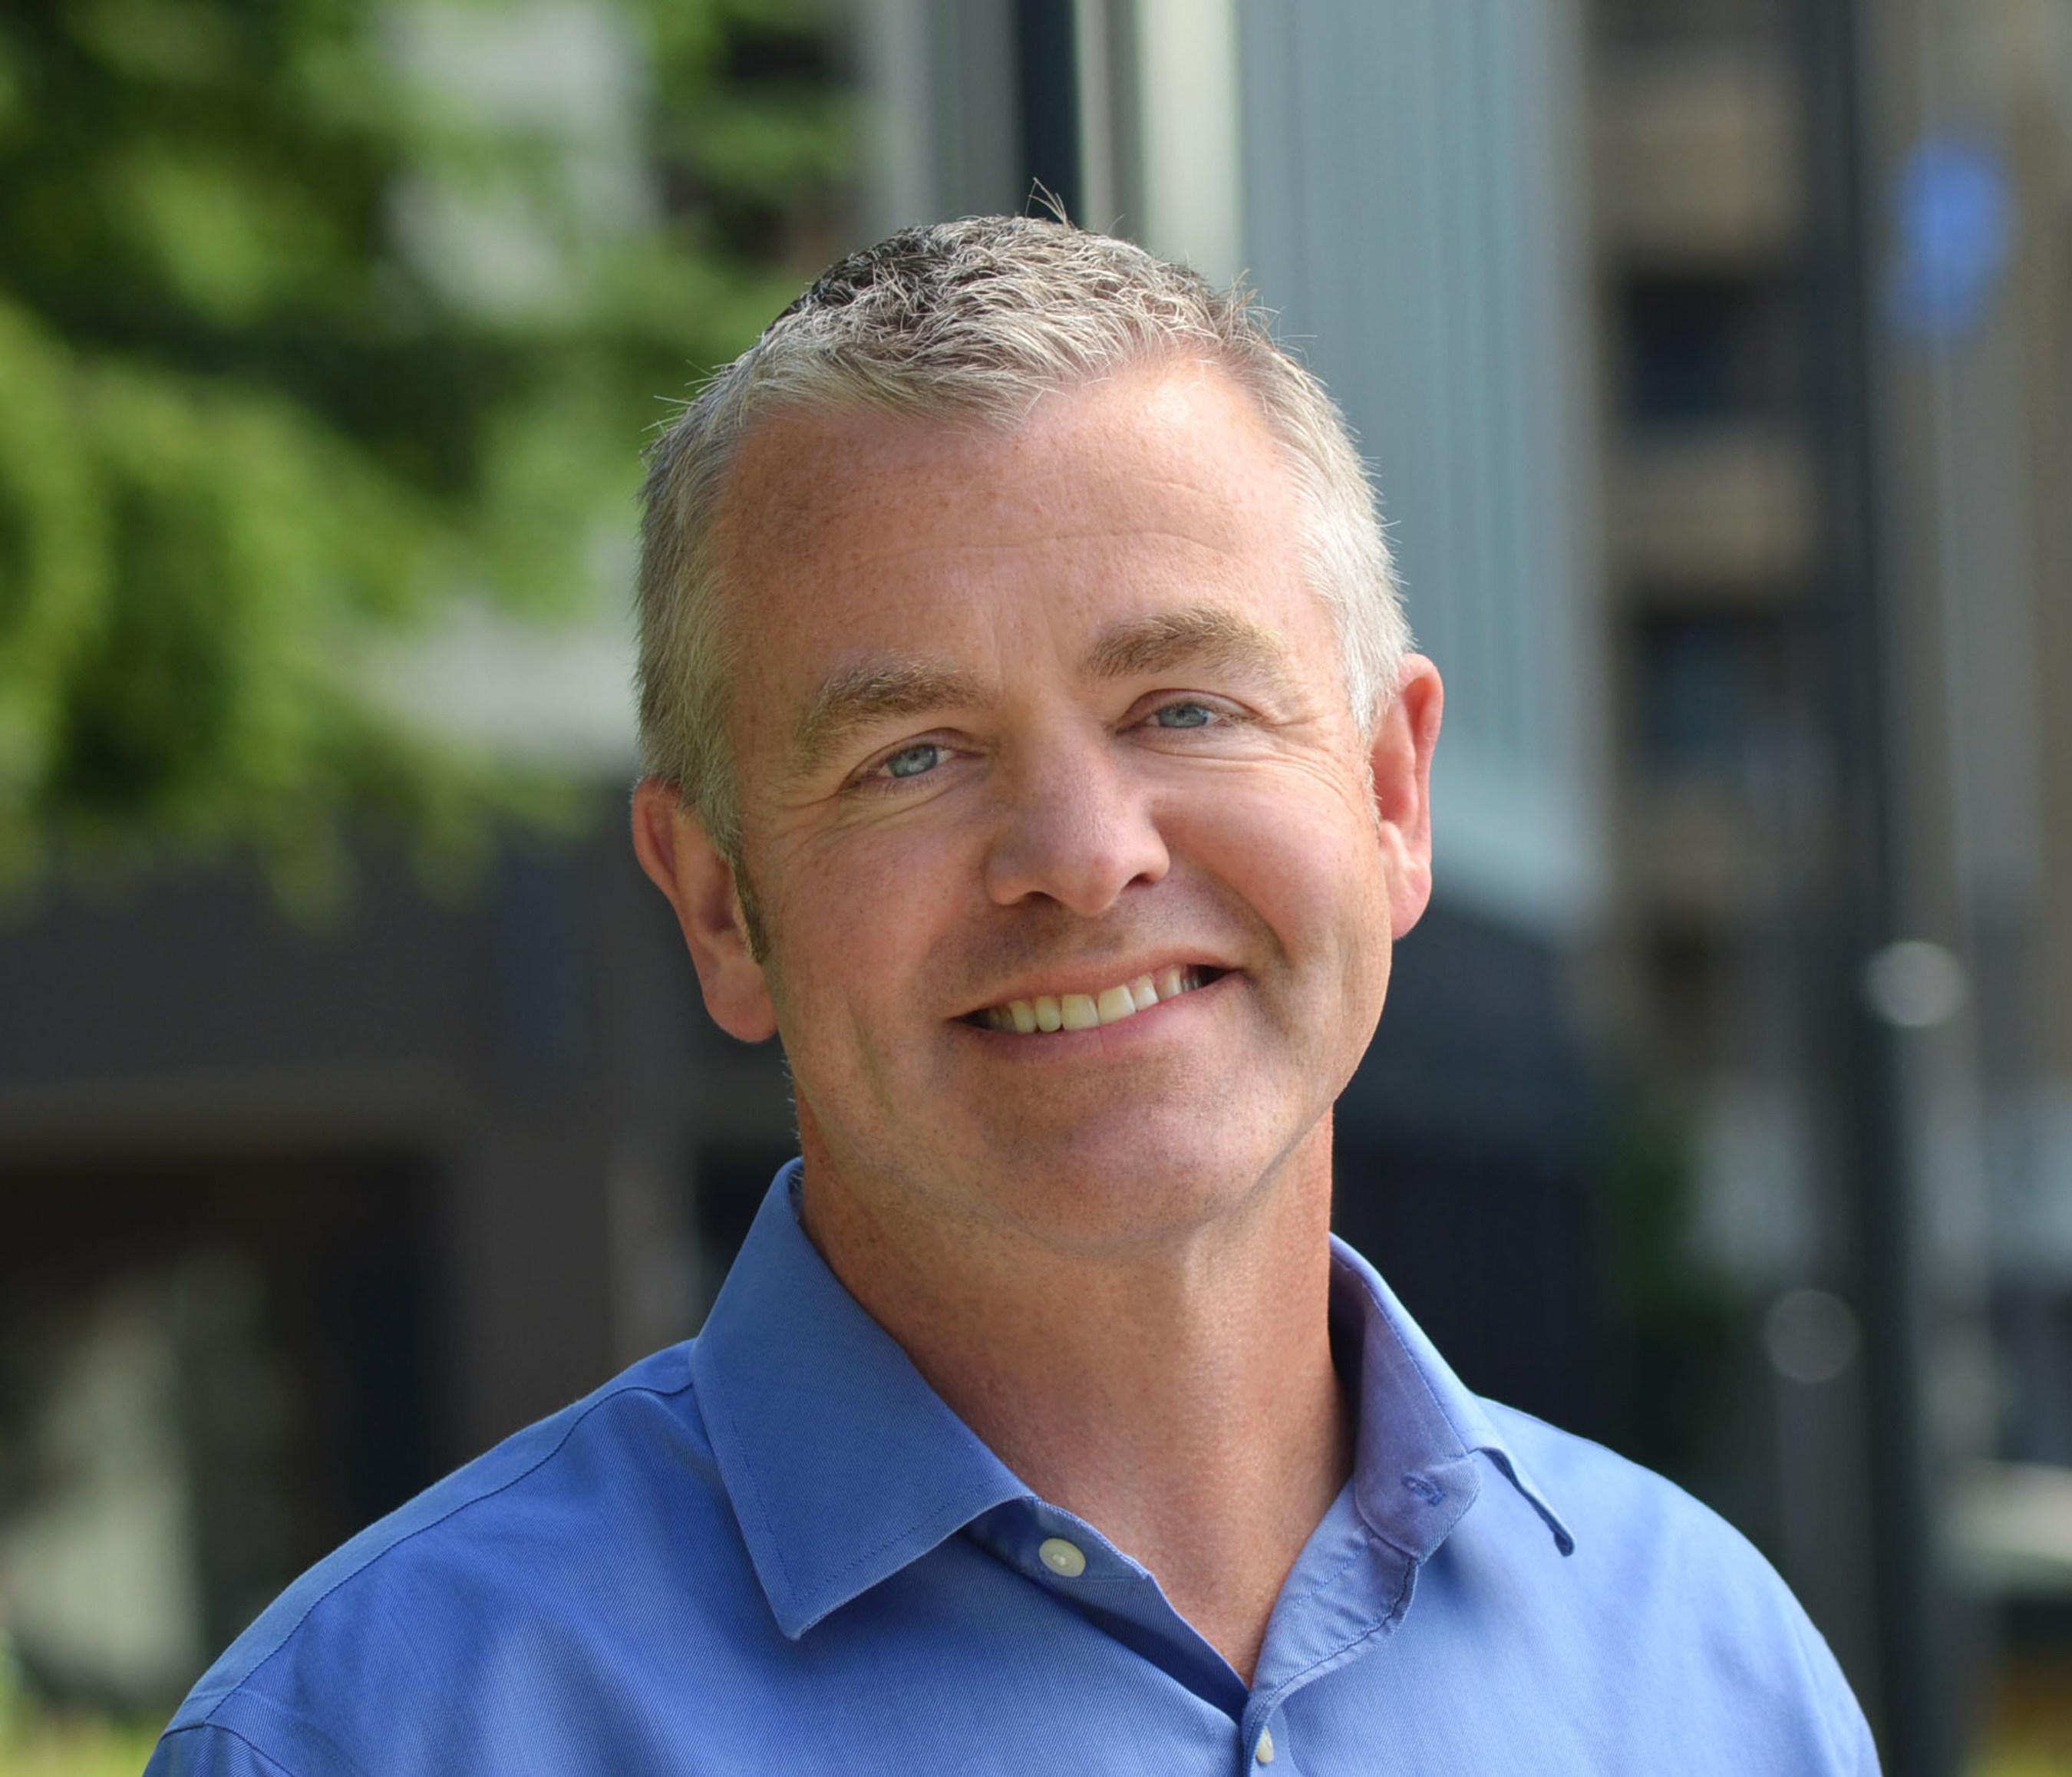 Josh Waldo is the VP of Partner Strategy & Programs at Nintex.